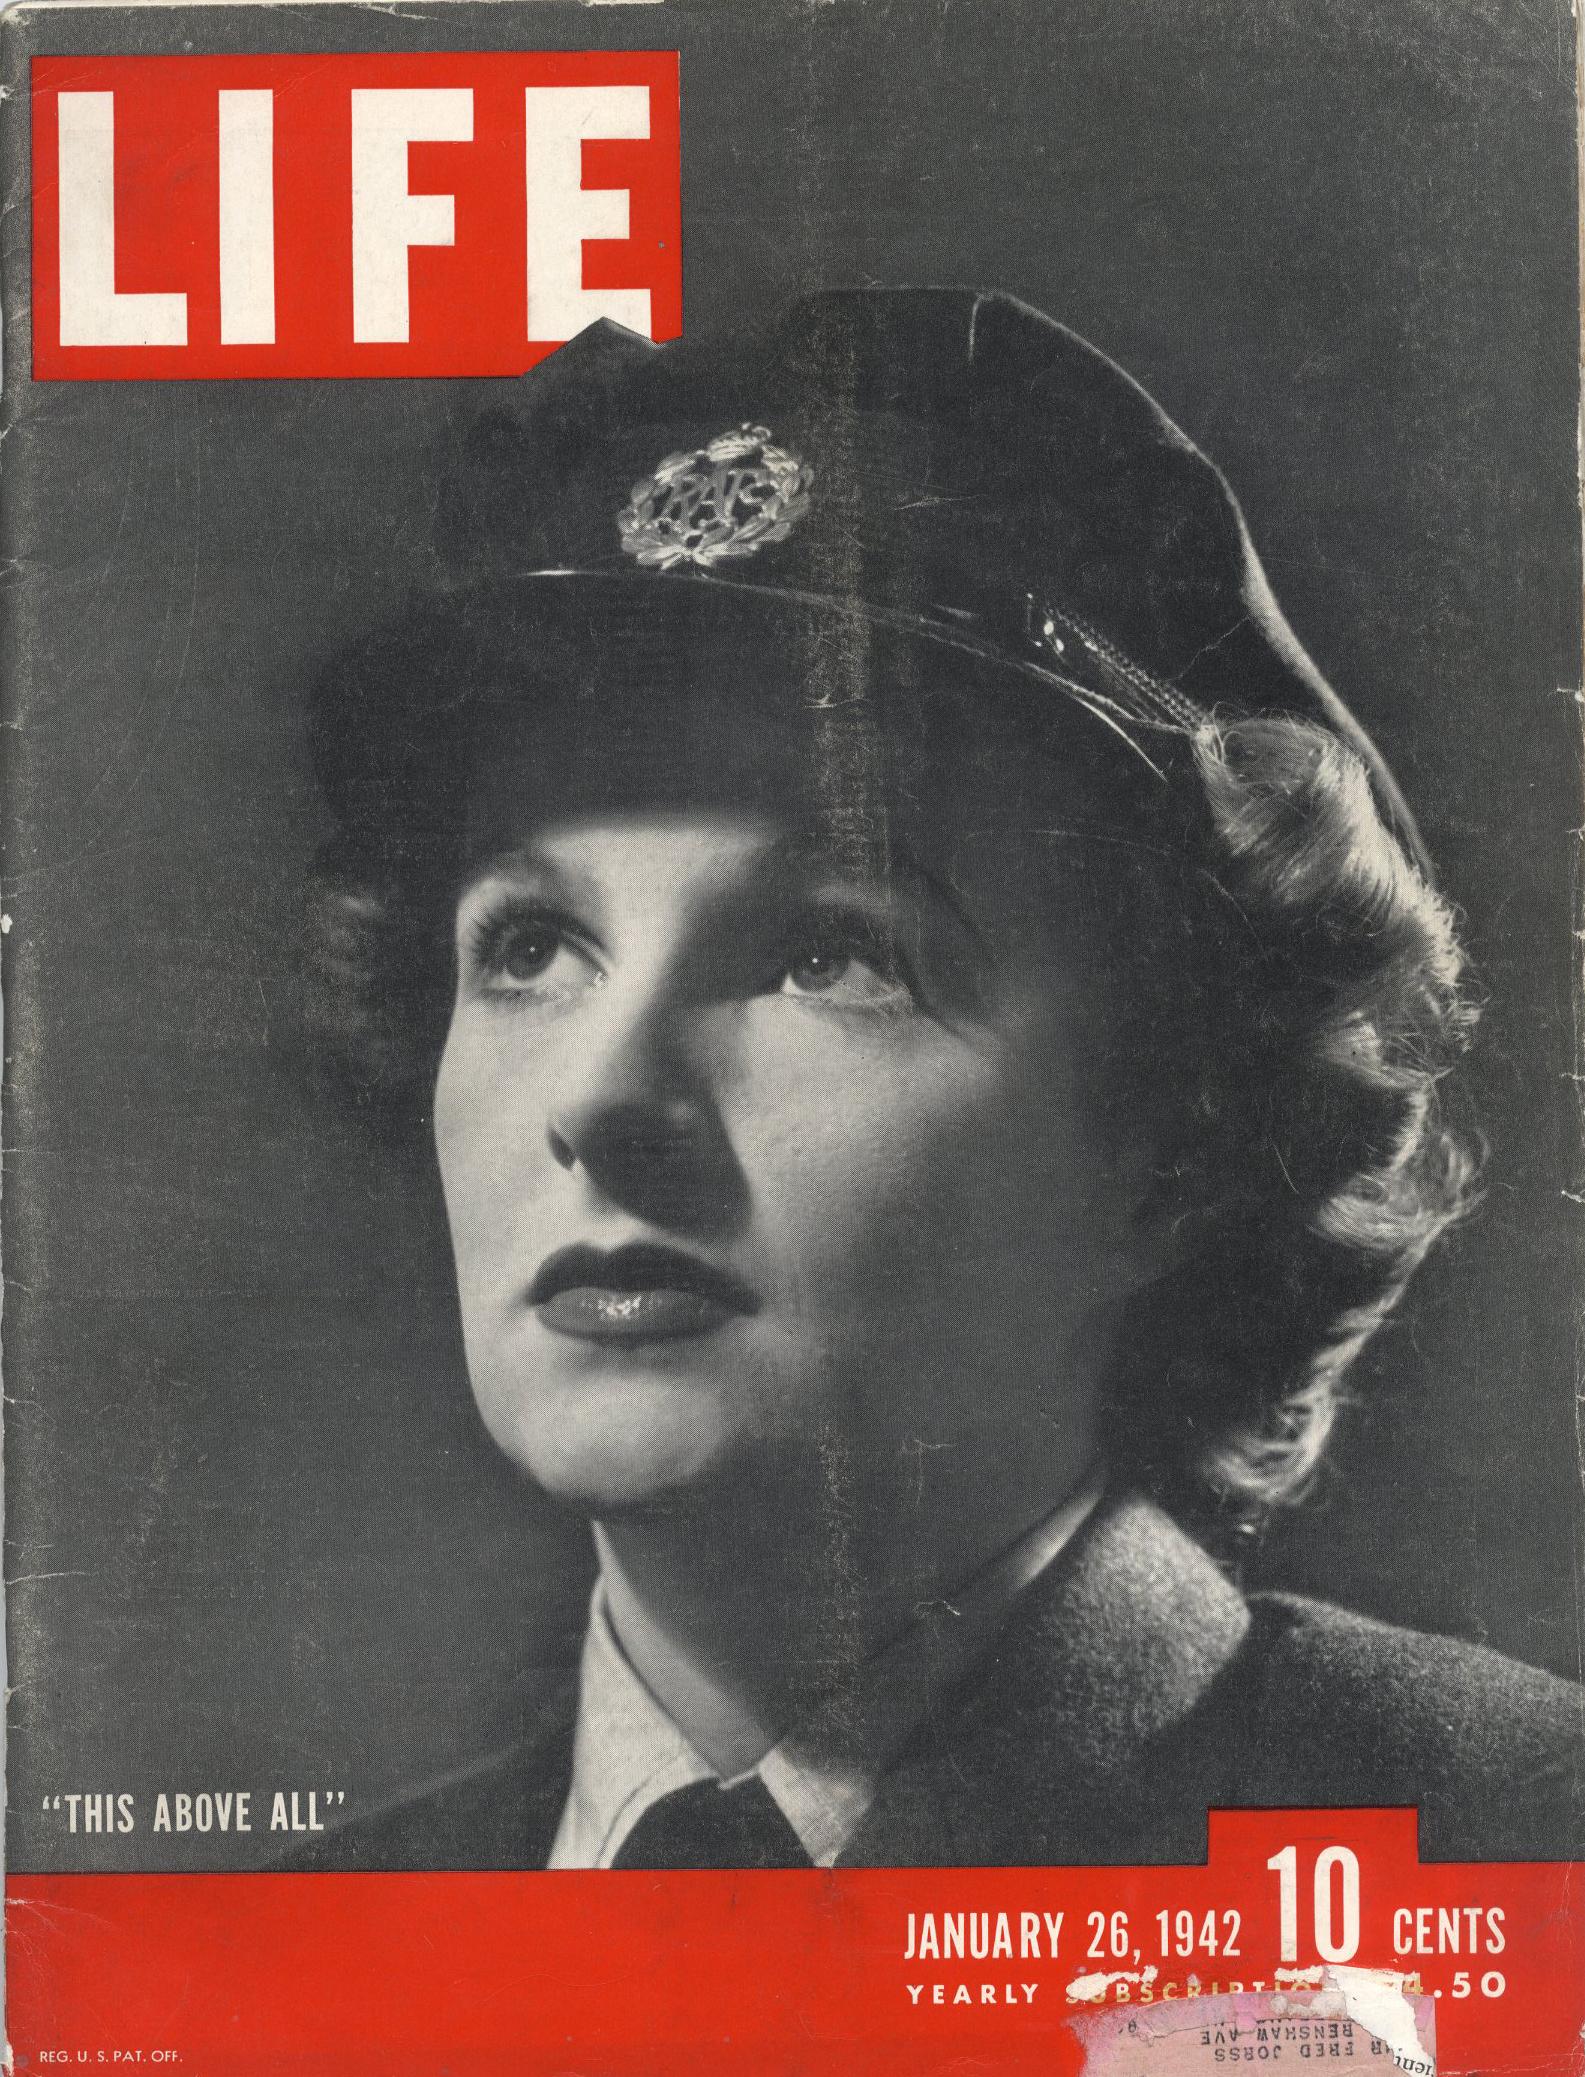 LIFE Magazine 1940's and 1960's